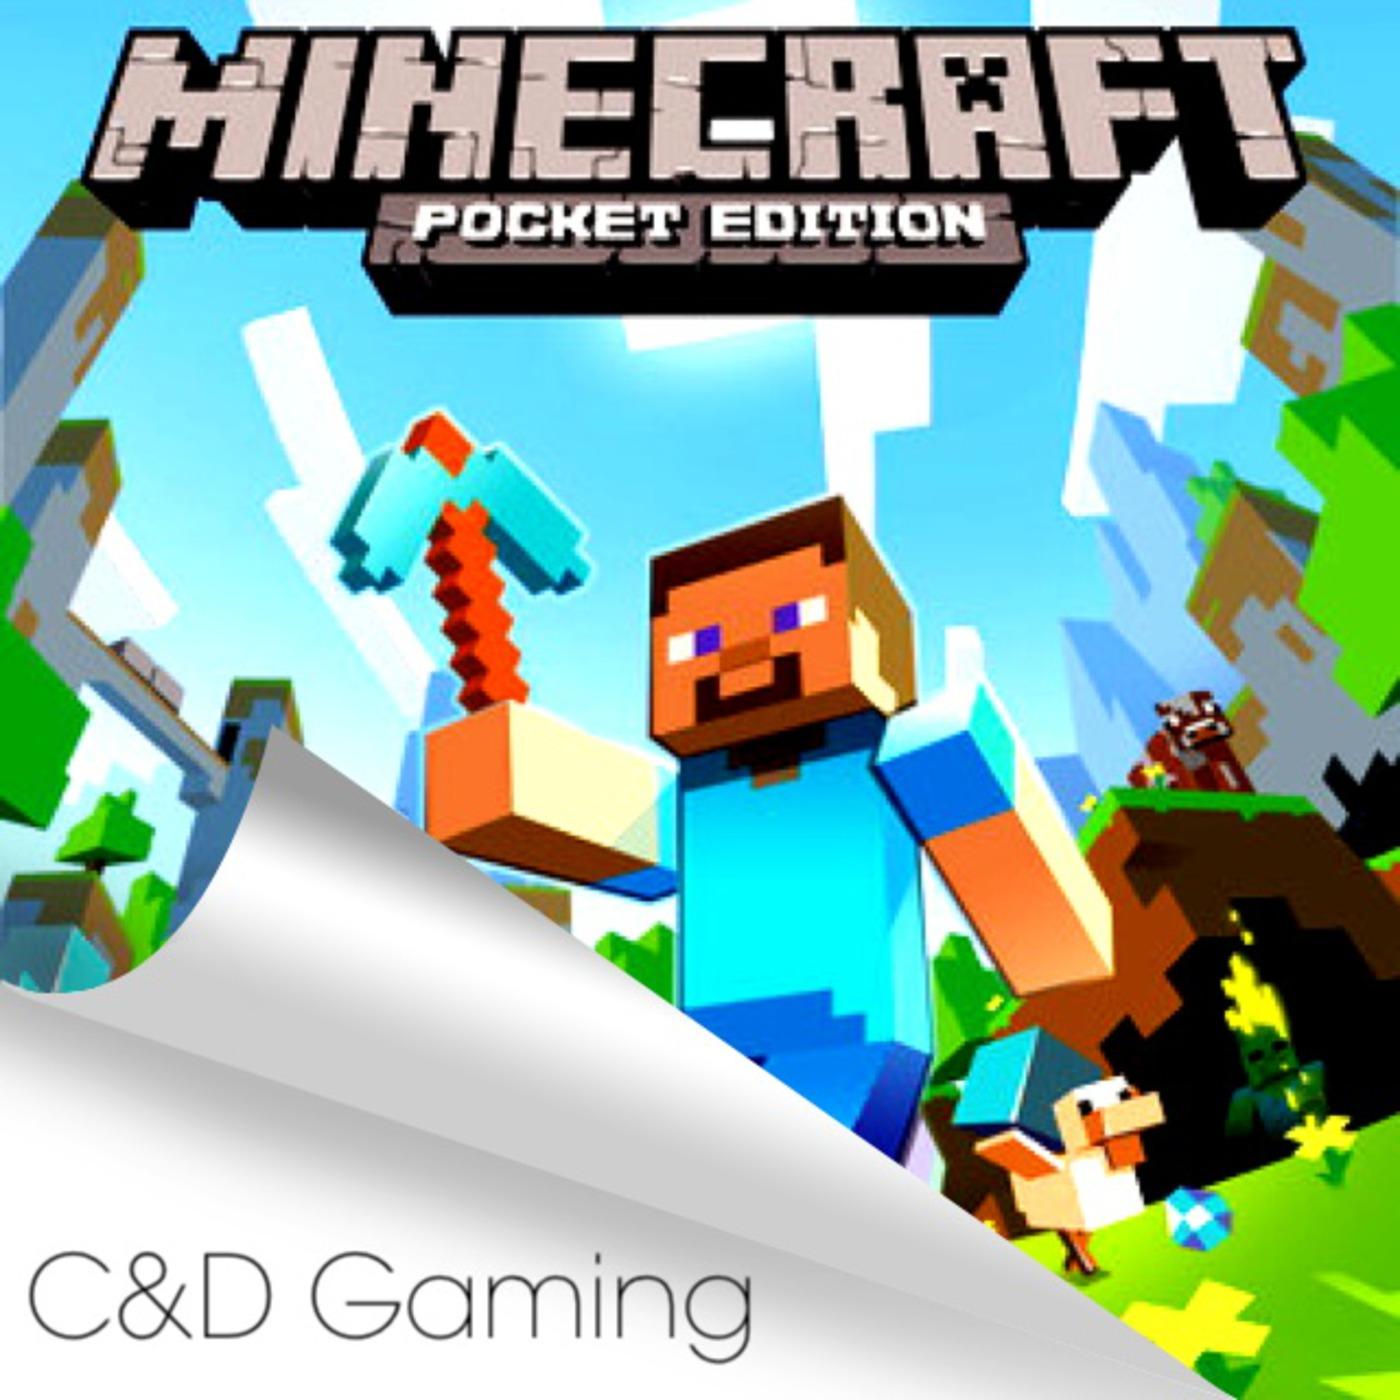 C&D Gaming